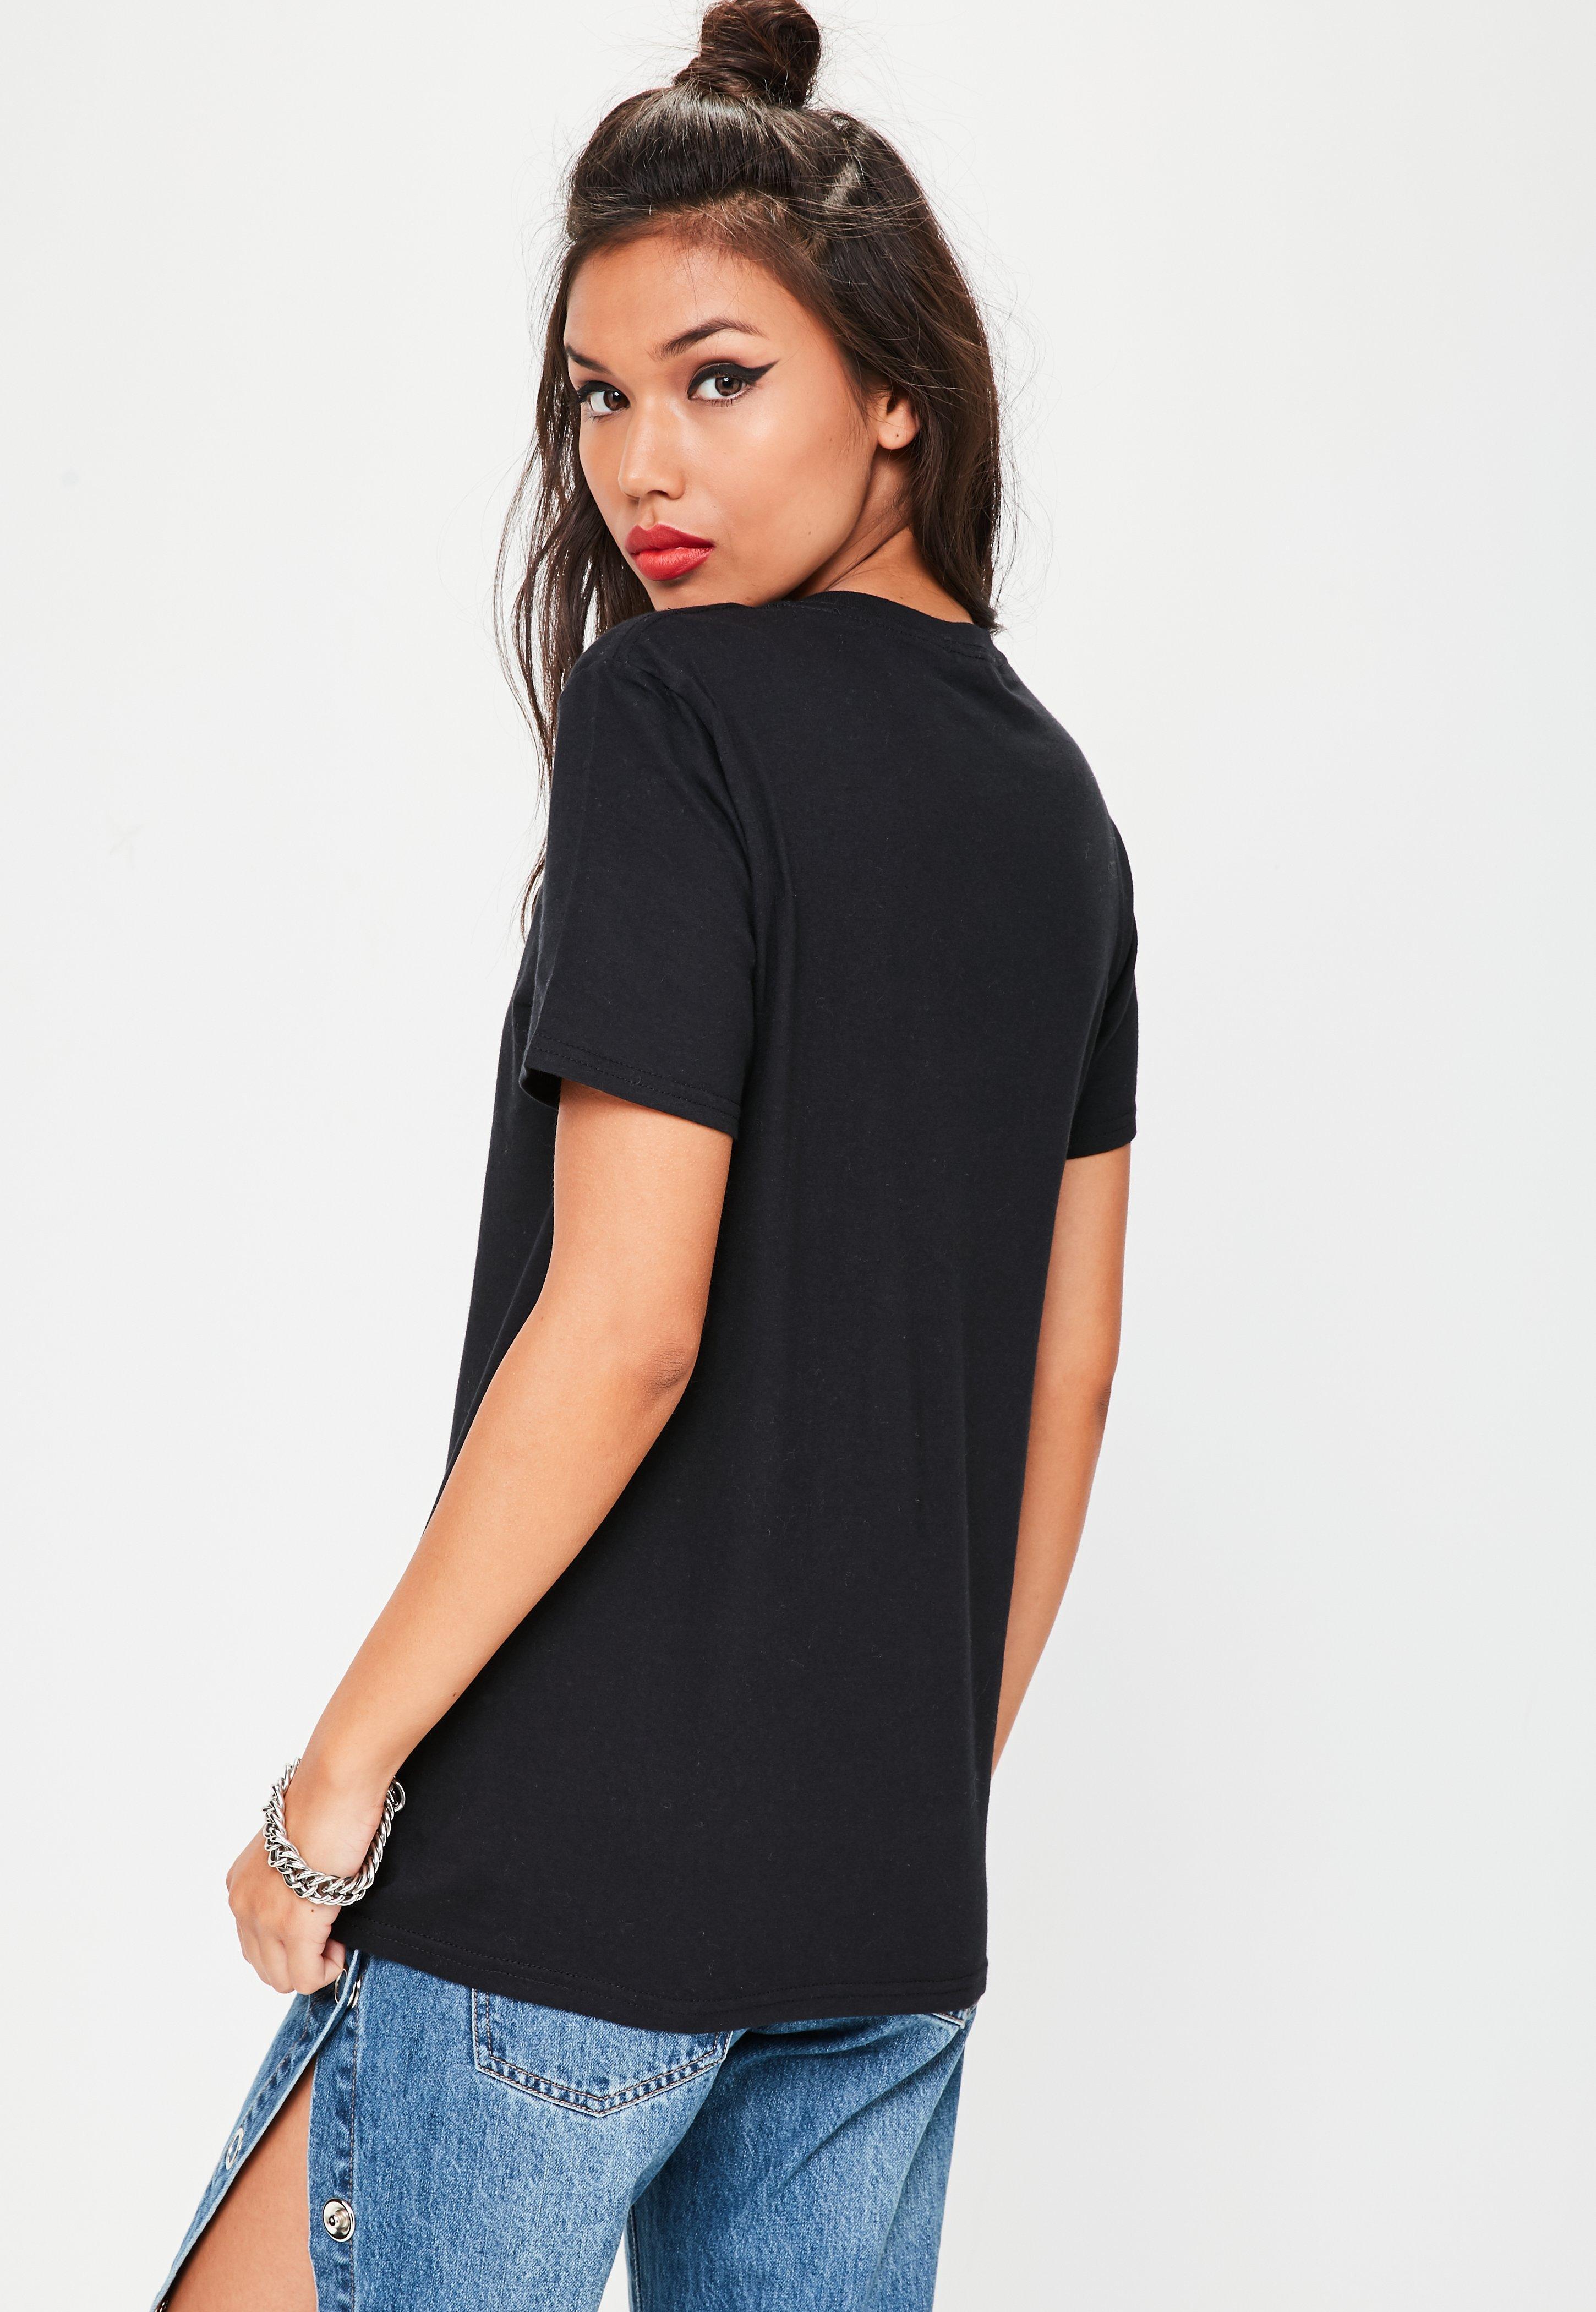 Missguided Black K Bye T-shirt In Black